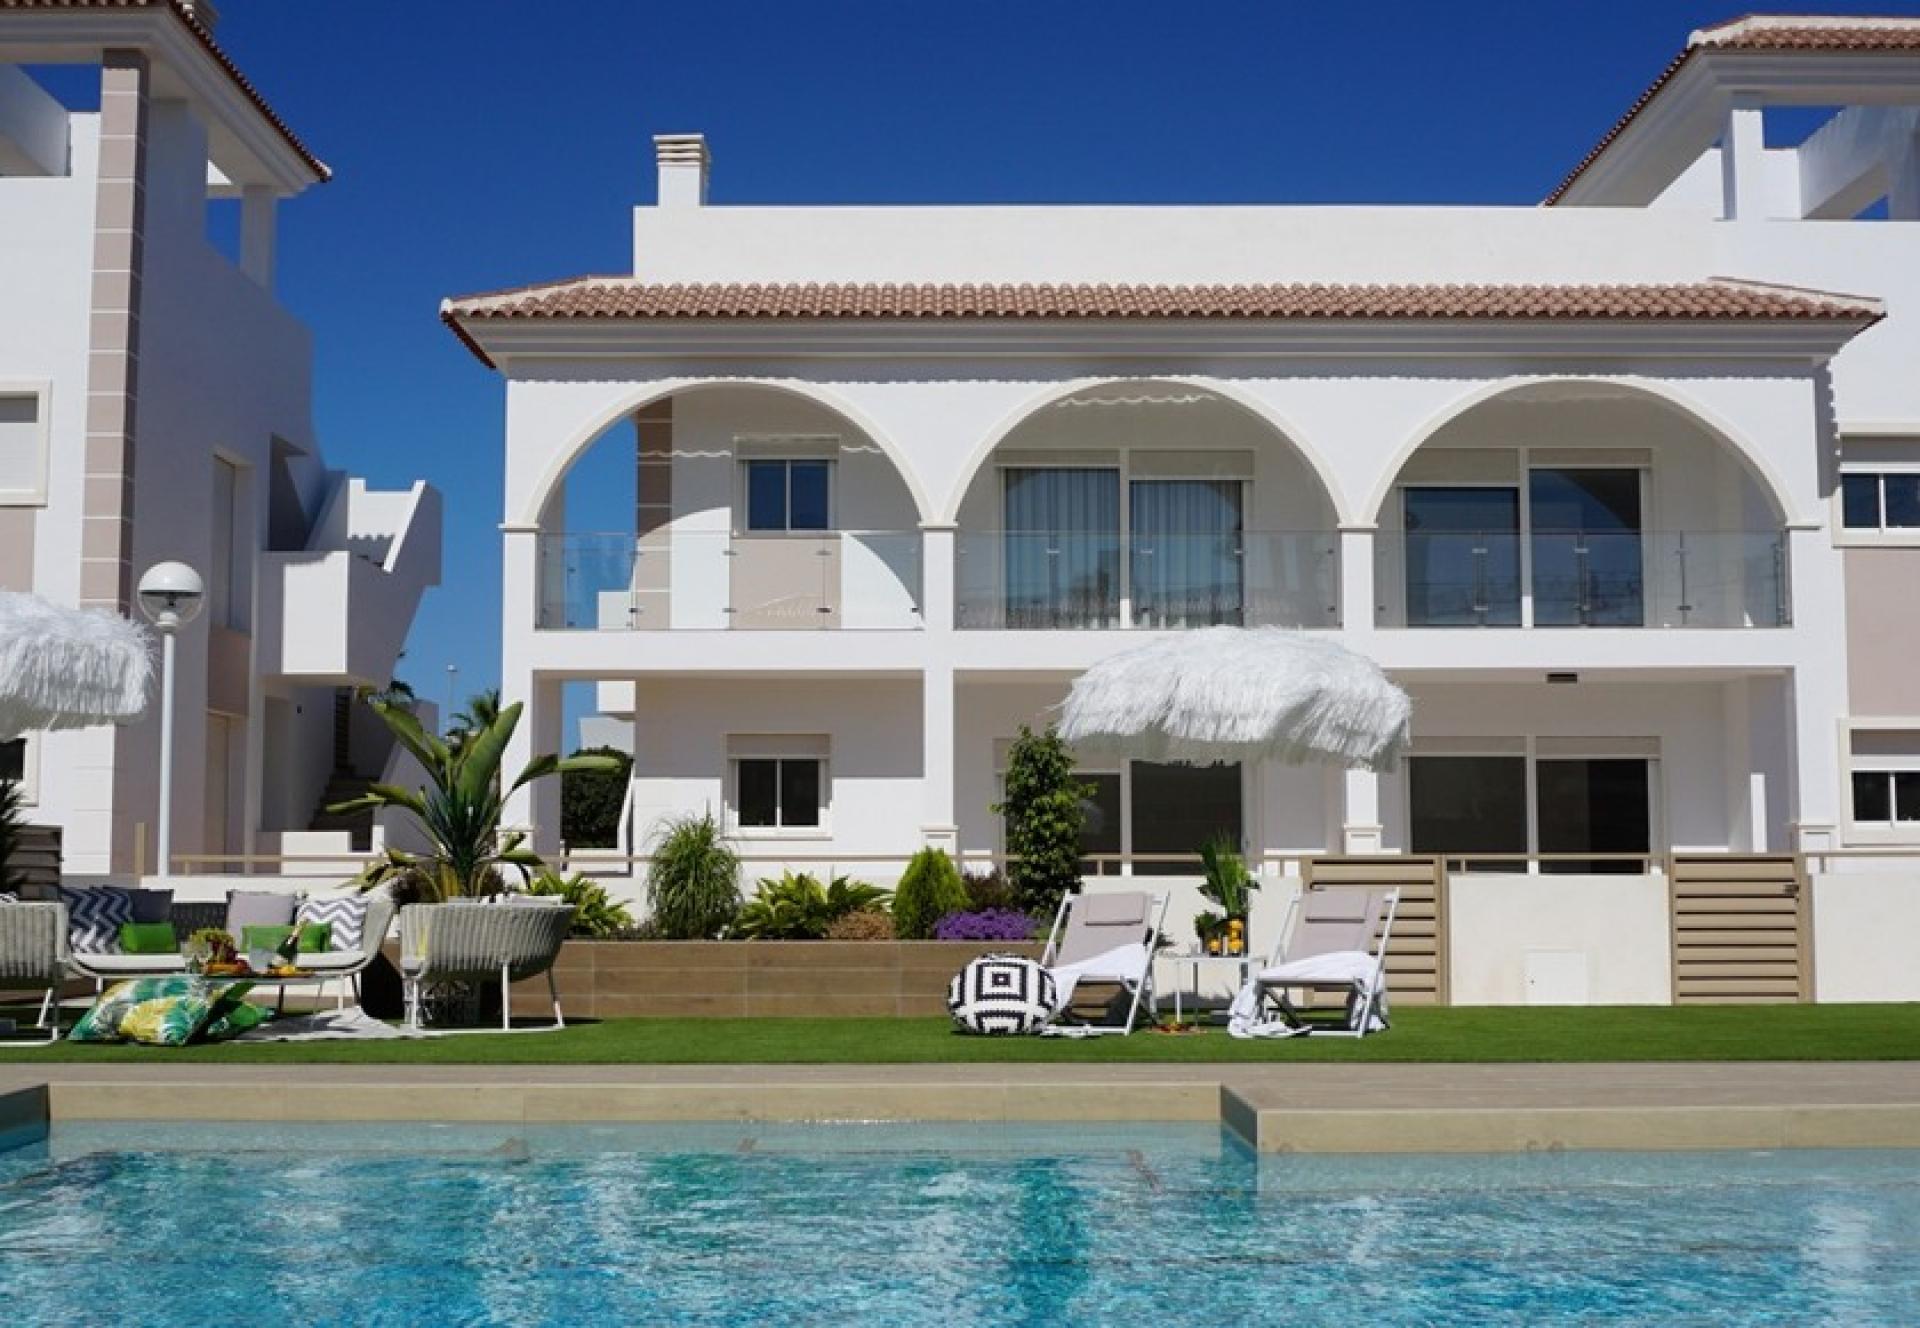 Appartement au rez-de-chaussée prêt à emménager Dona Pepa, Ciudad Quesada in Medvilla Spanje